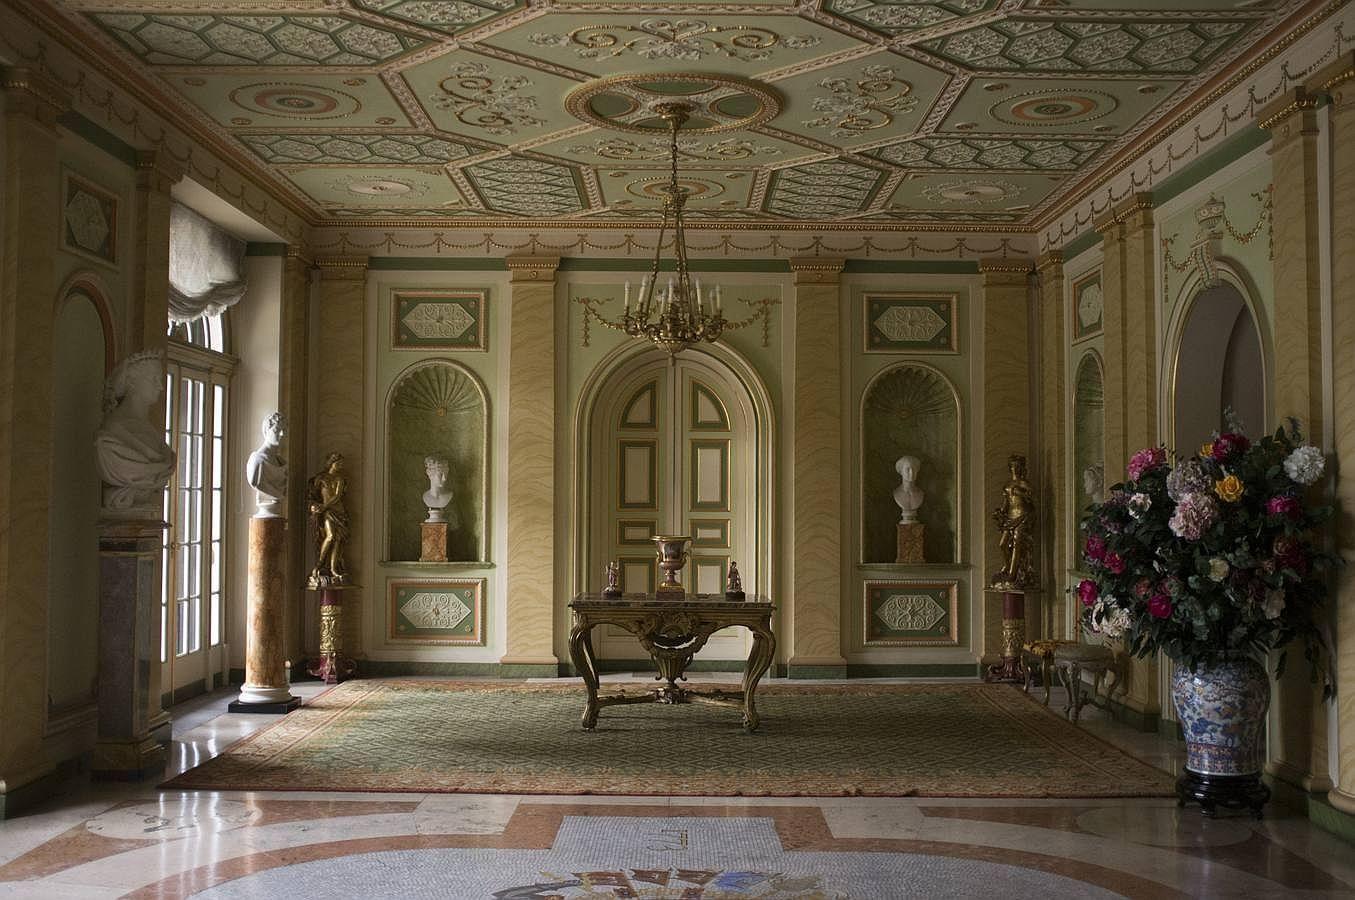 Viaje al interior del palacio de liria la majestuosa residencia de la casa de alba - Casa santona madrid ...